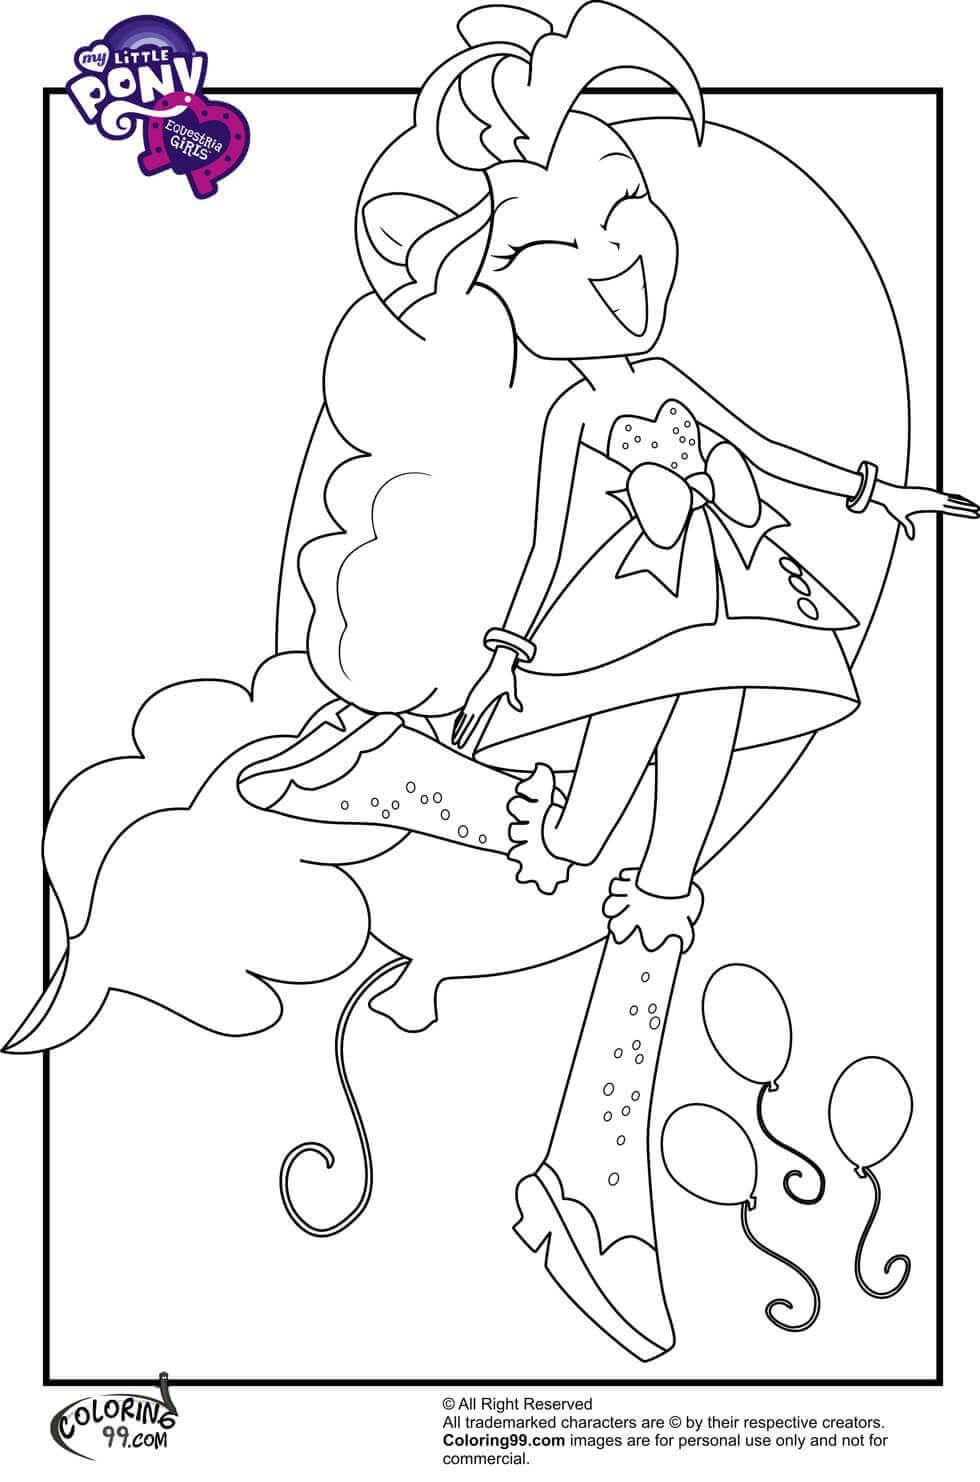 Pinkie Pie From My Little Pony Equestria Girls Coloring Page My Little Pony Coloring Coloring Pages For Girls My Little Pony Twilight